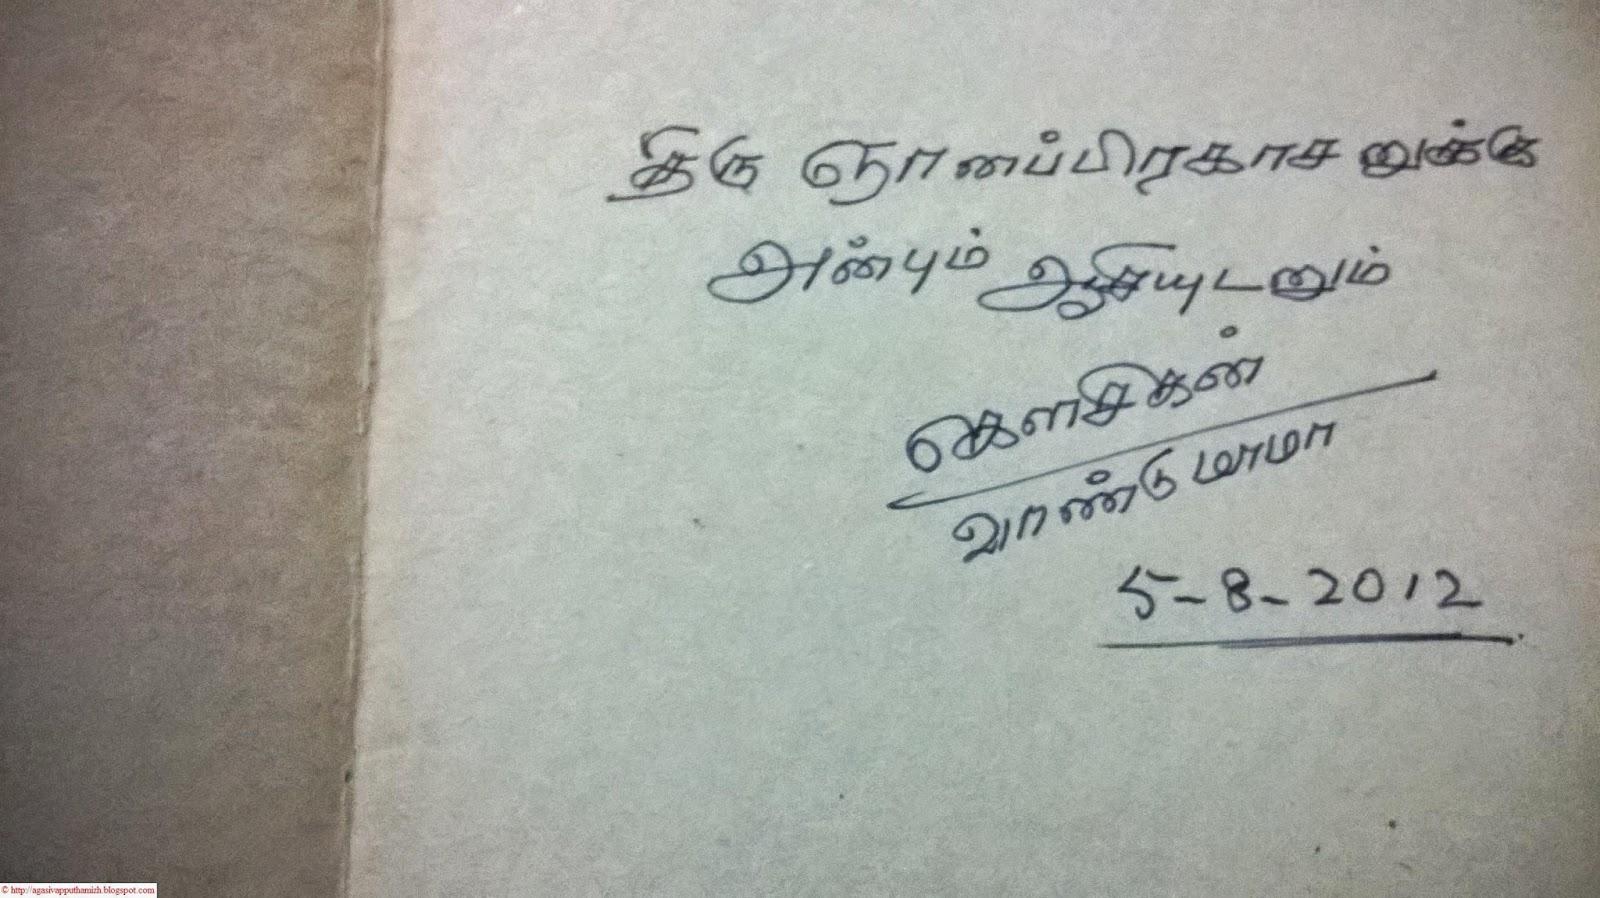 Vaandumama's Autograph for me